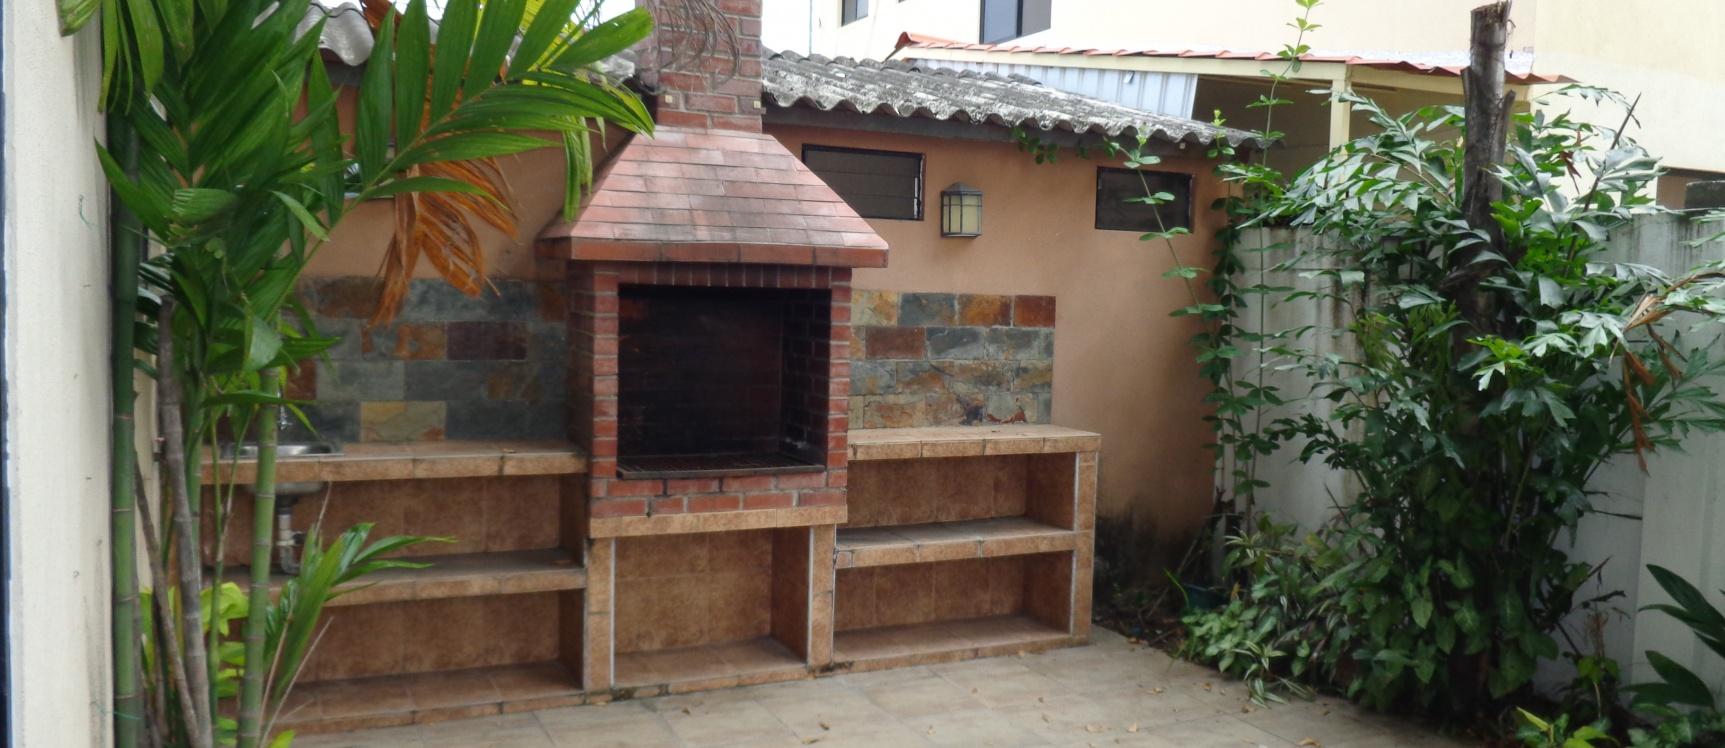 Casa moderna en venta urb volare samborond n guayaquil for Casa moderna 80m2